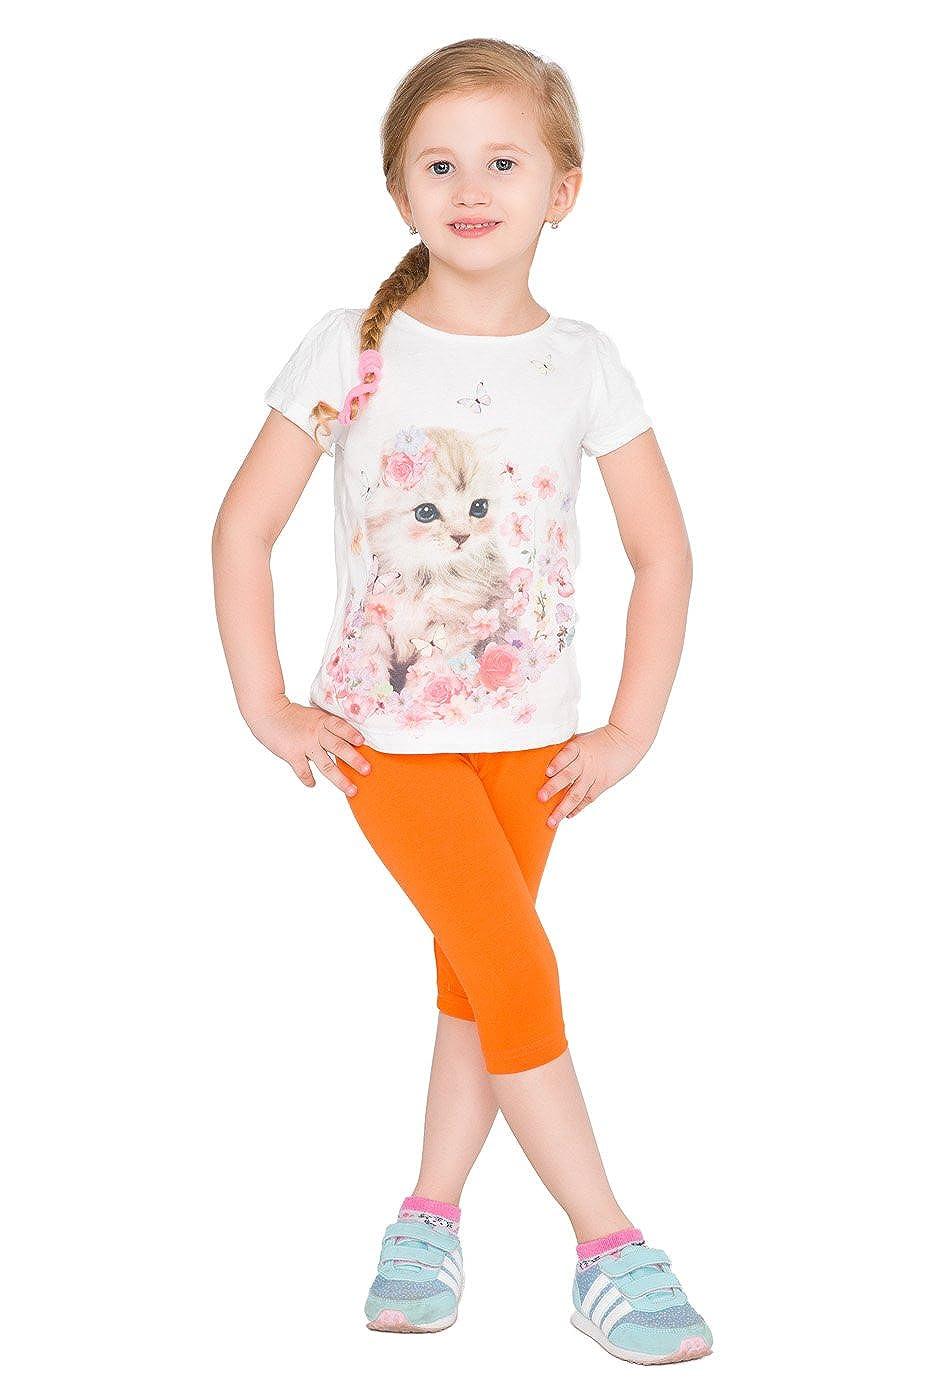 1b7b70e82 hi!mom - Leggings pirata infantiles - Algodón - Colores lisos - Tallas 2-13  años